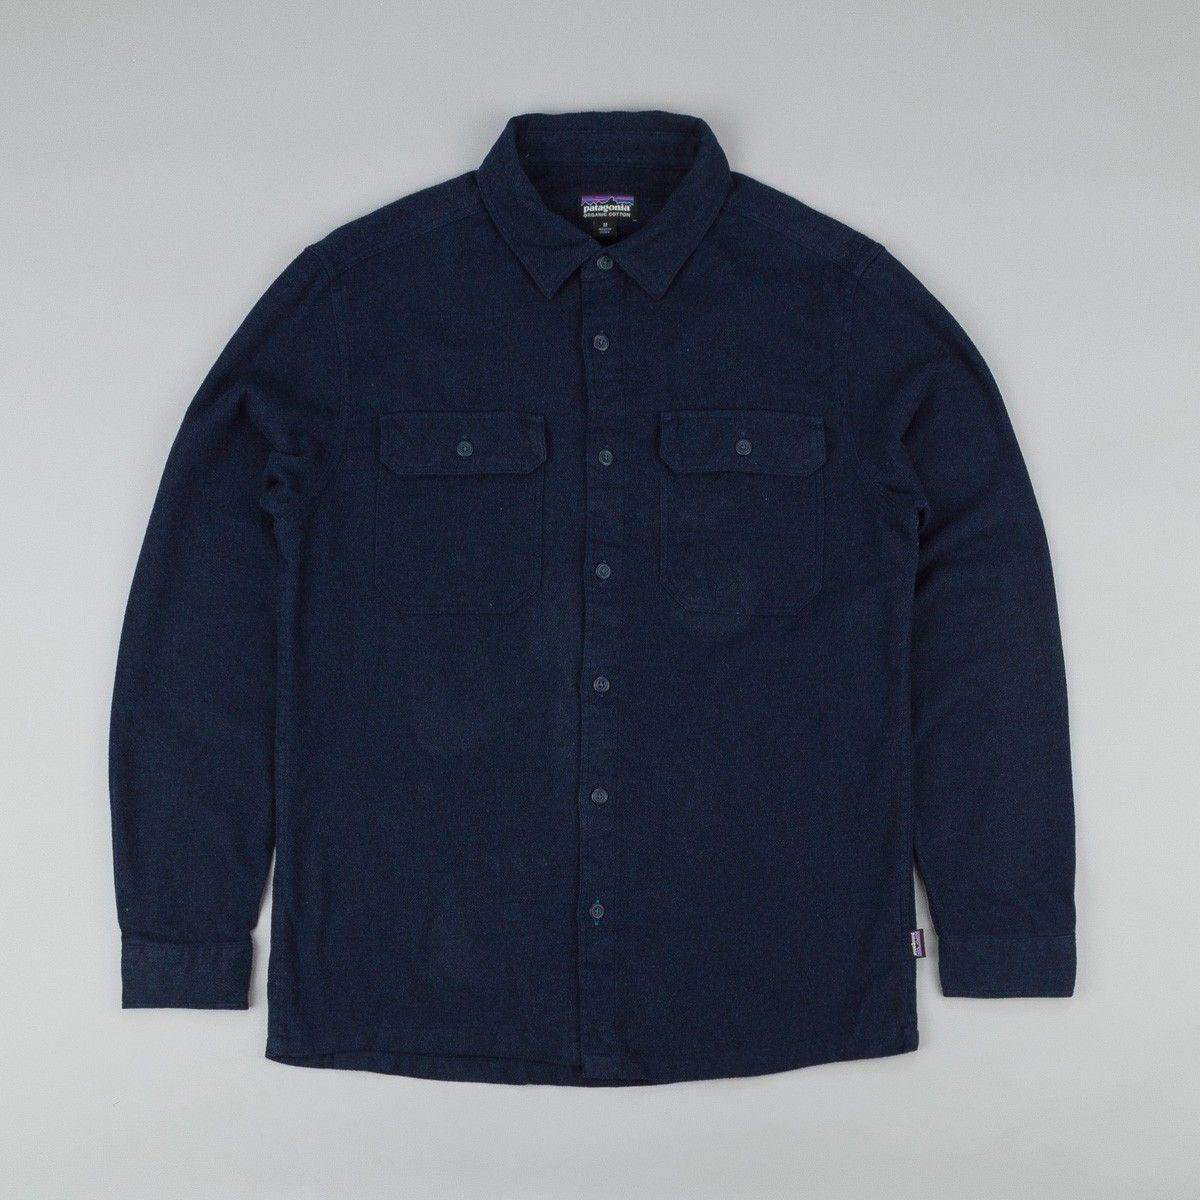 Patagonia Fjord Flannel Shirt - Navy Blue | Flatspot